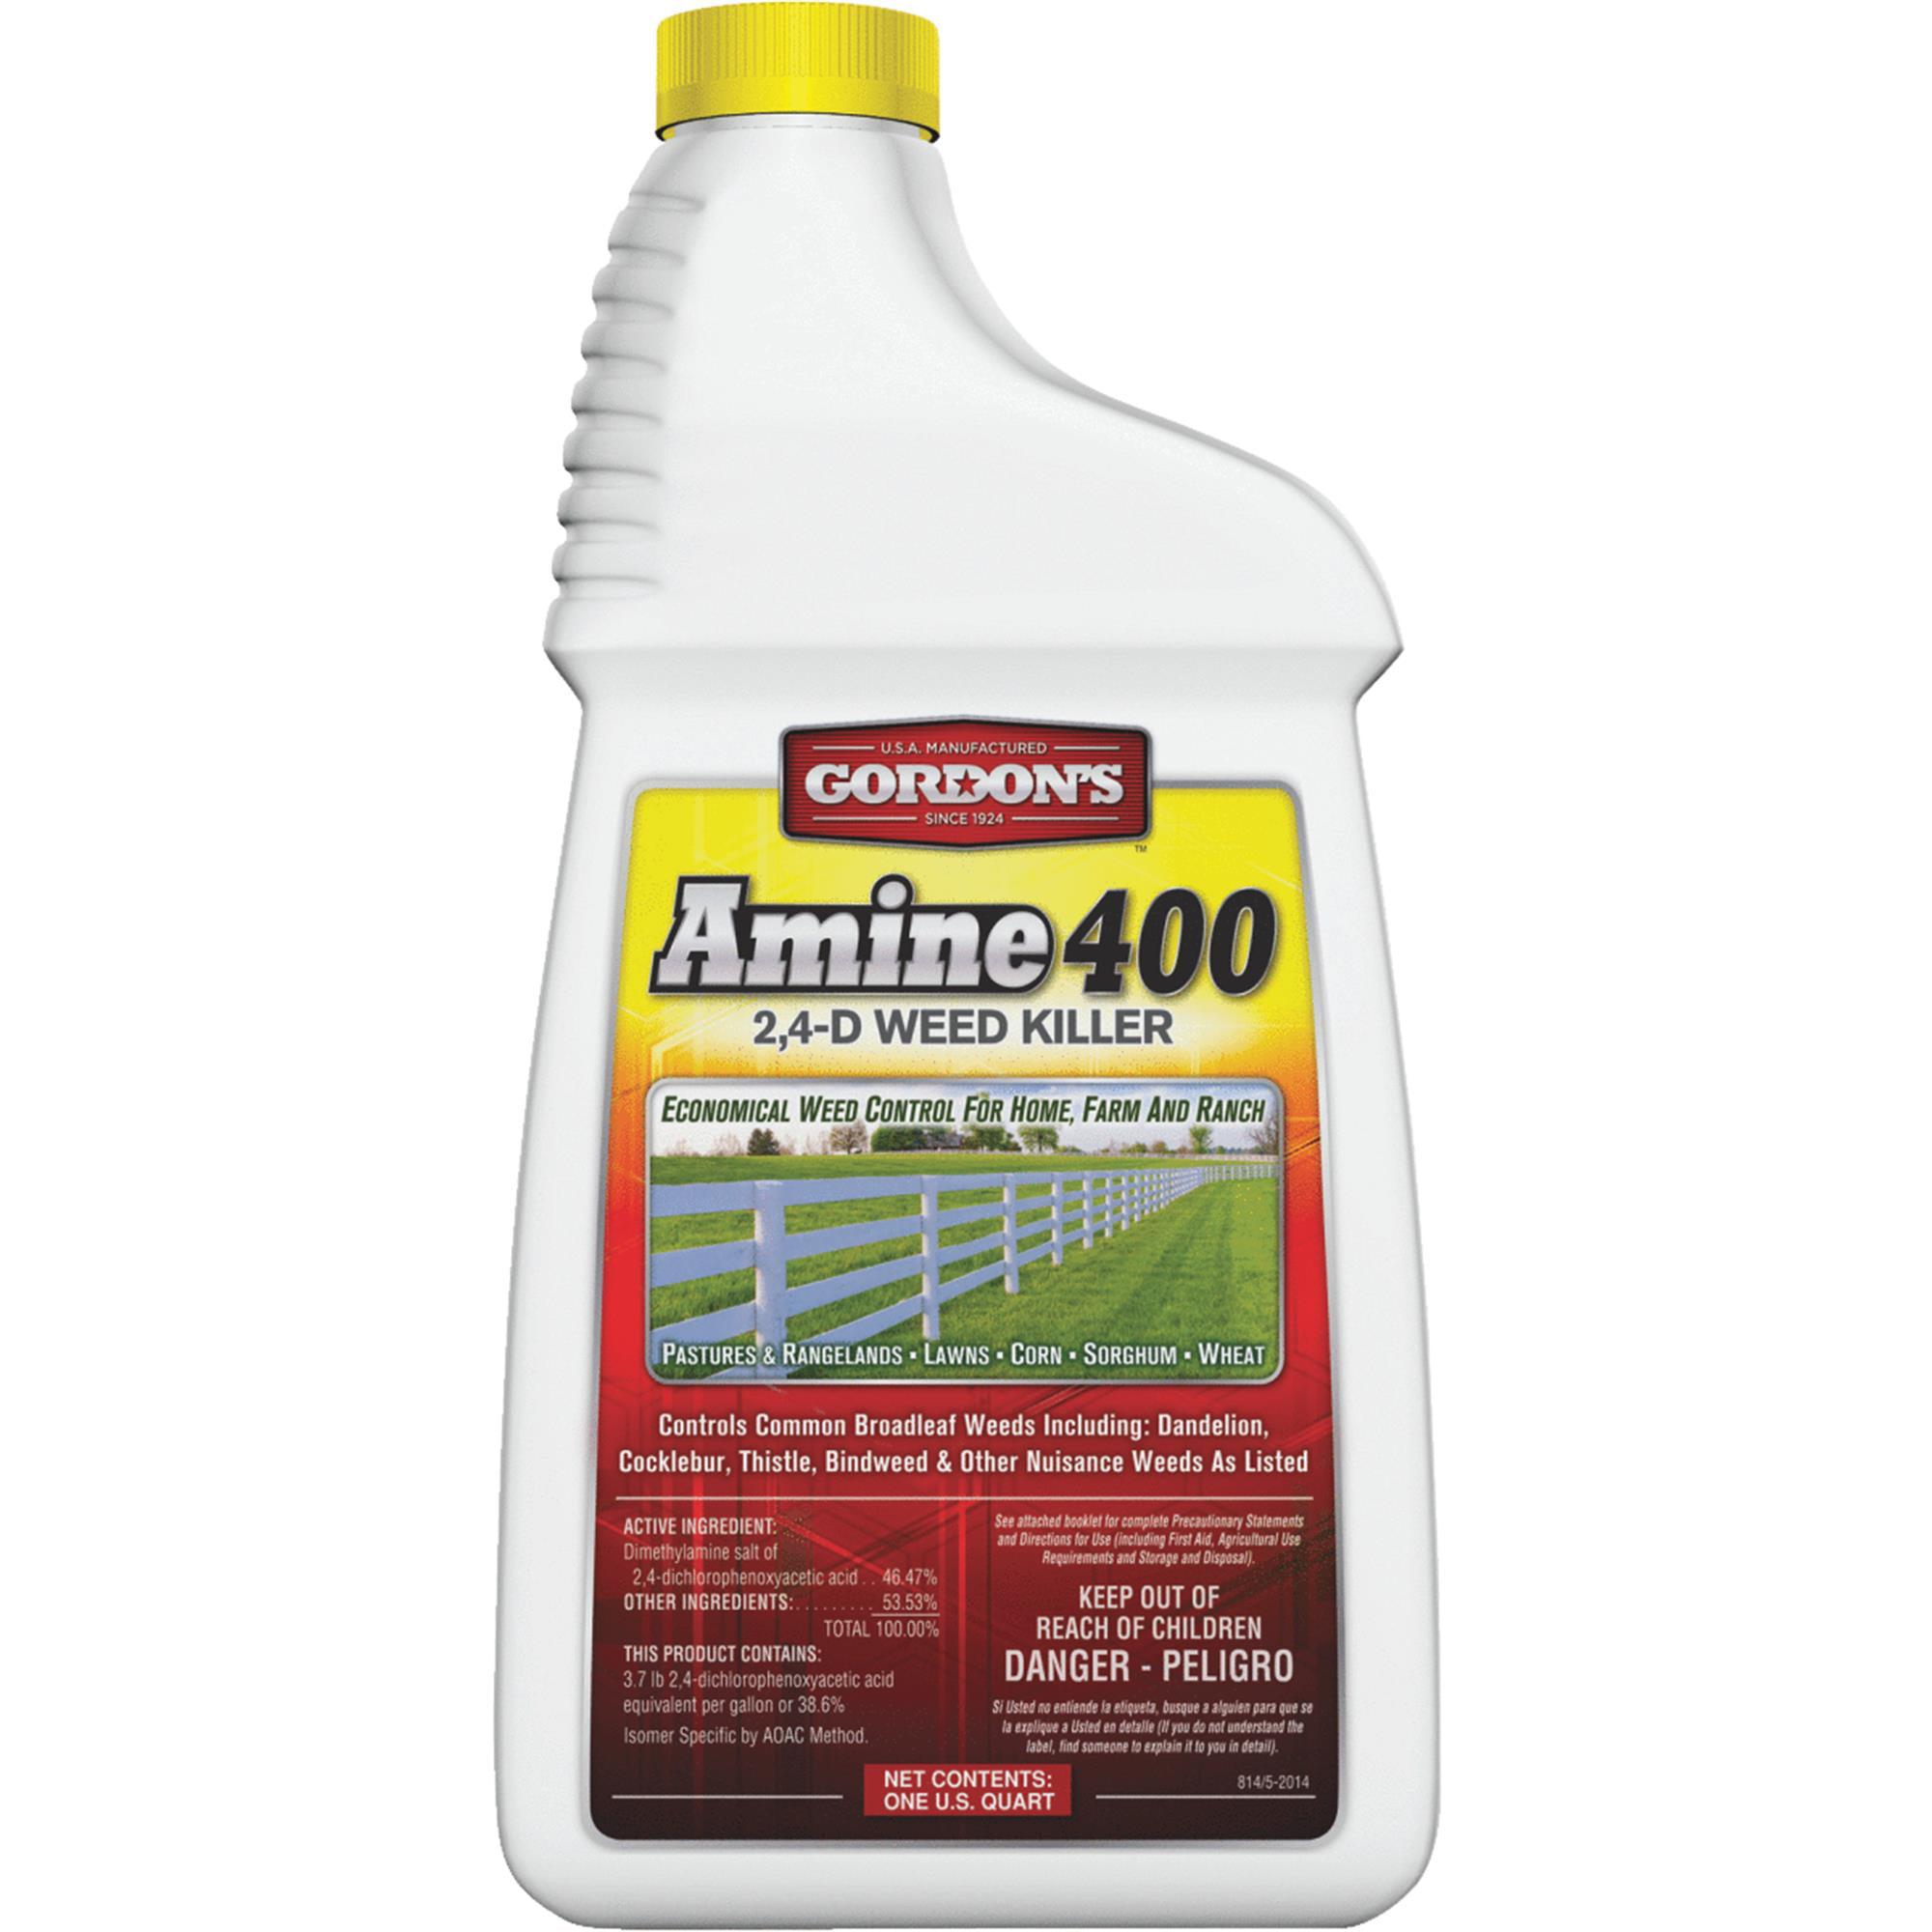 Gordons Amine400 Weed Killer